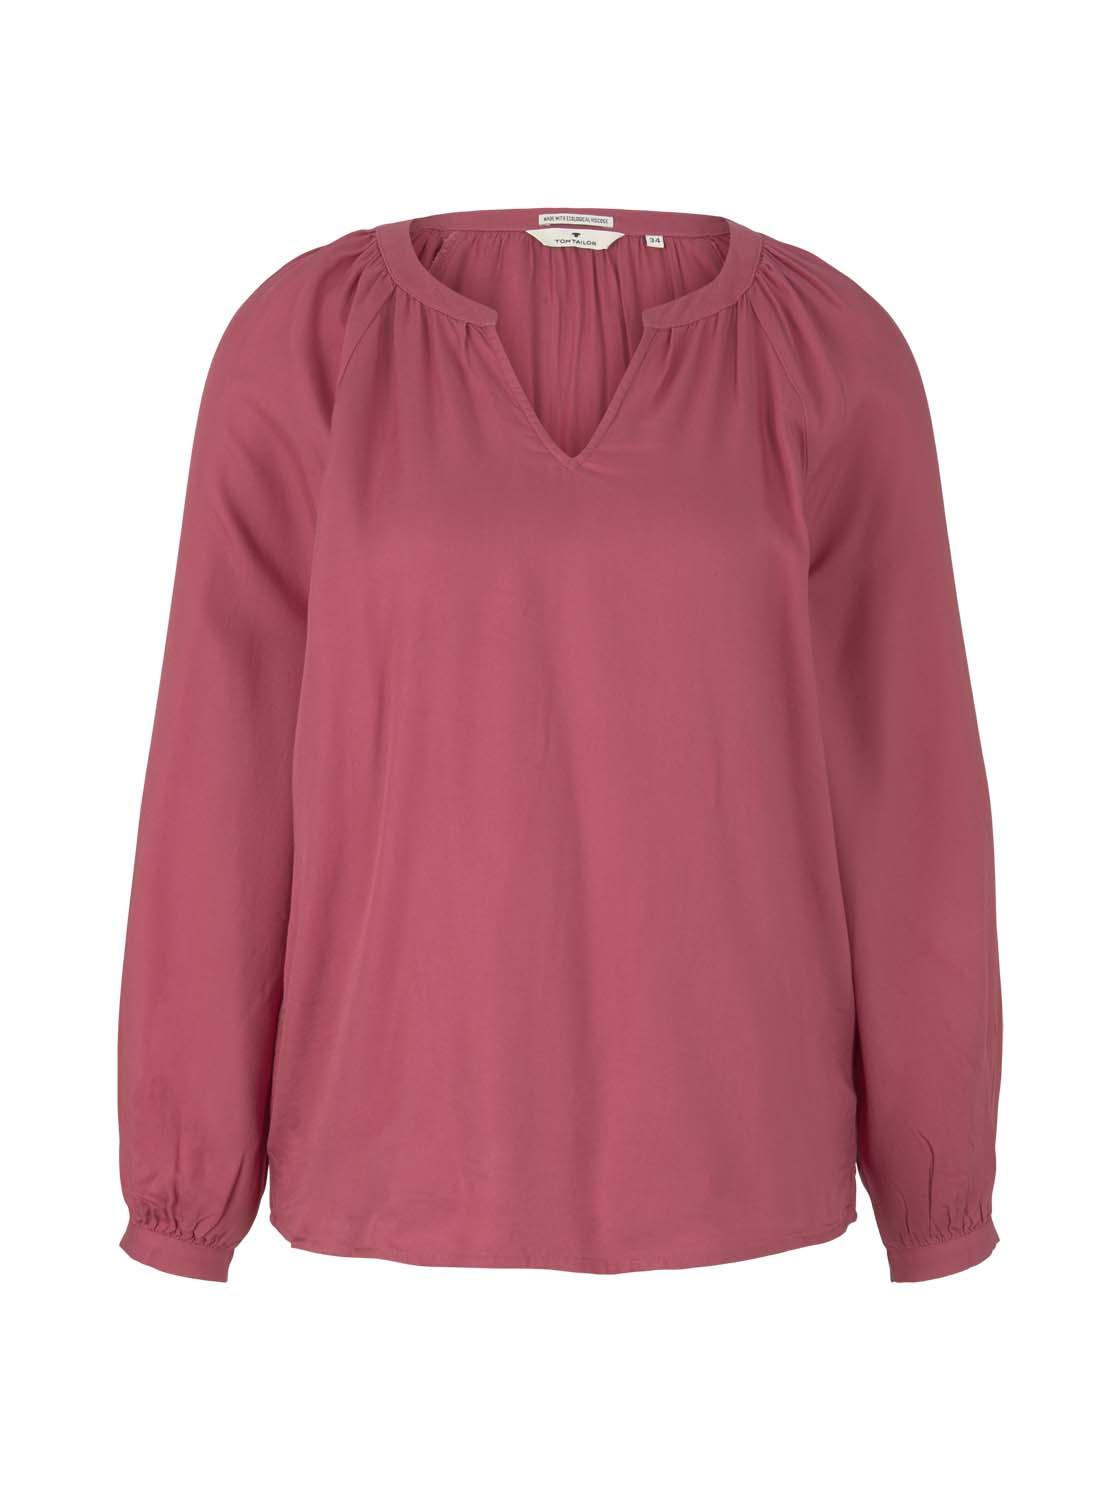 blouse feminine solid